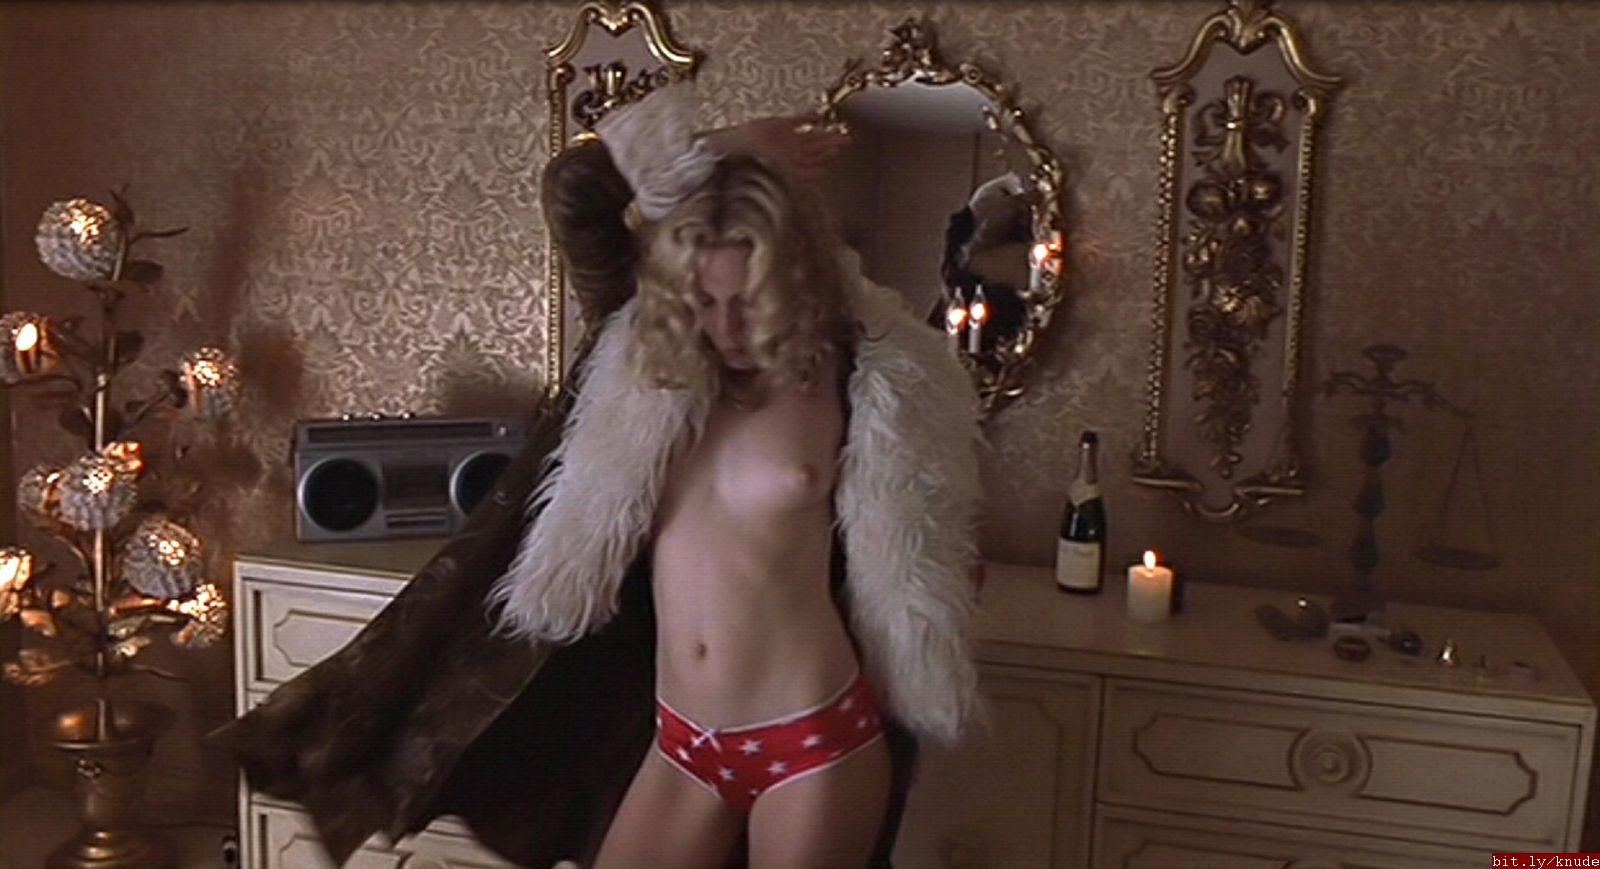 Kate Hudson Nude Photos & Videos - Celeb Jihad